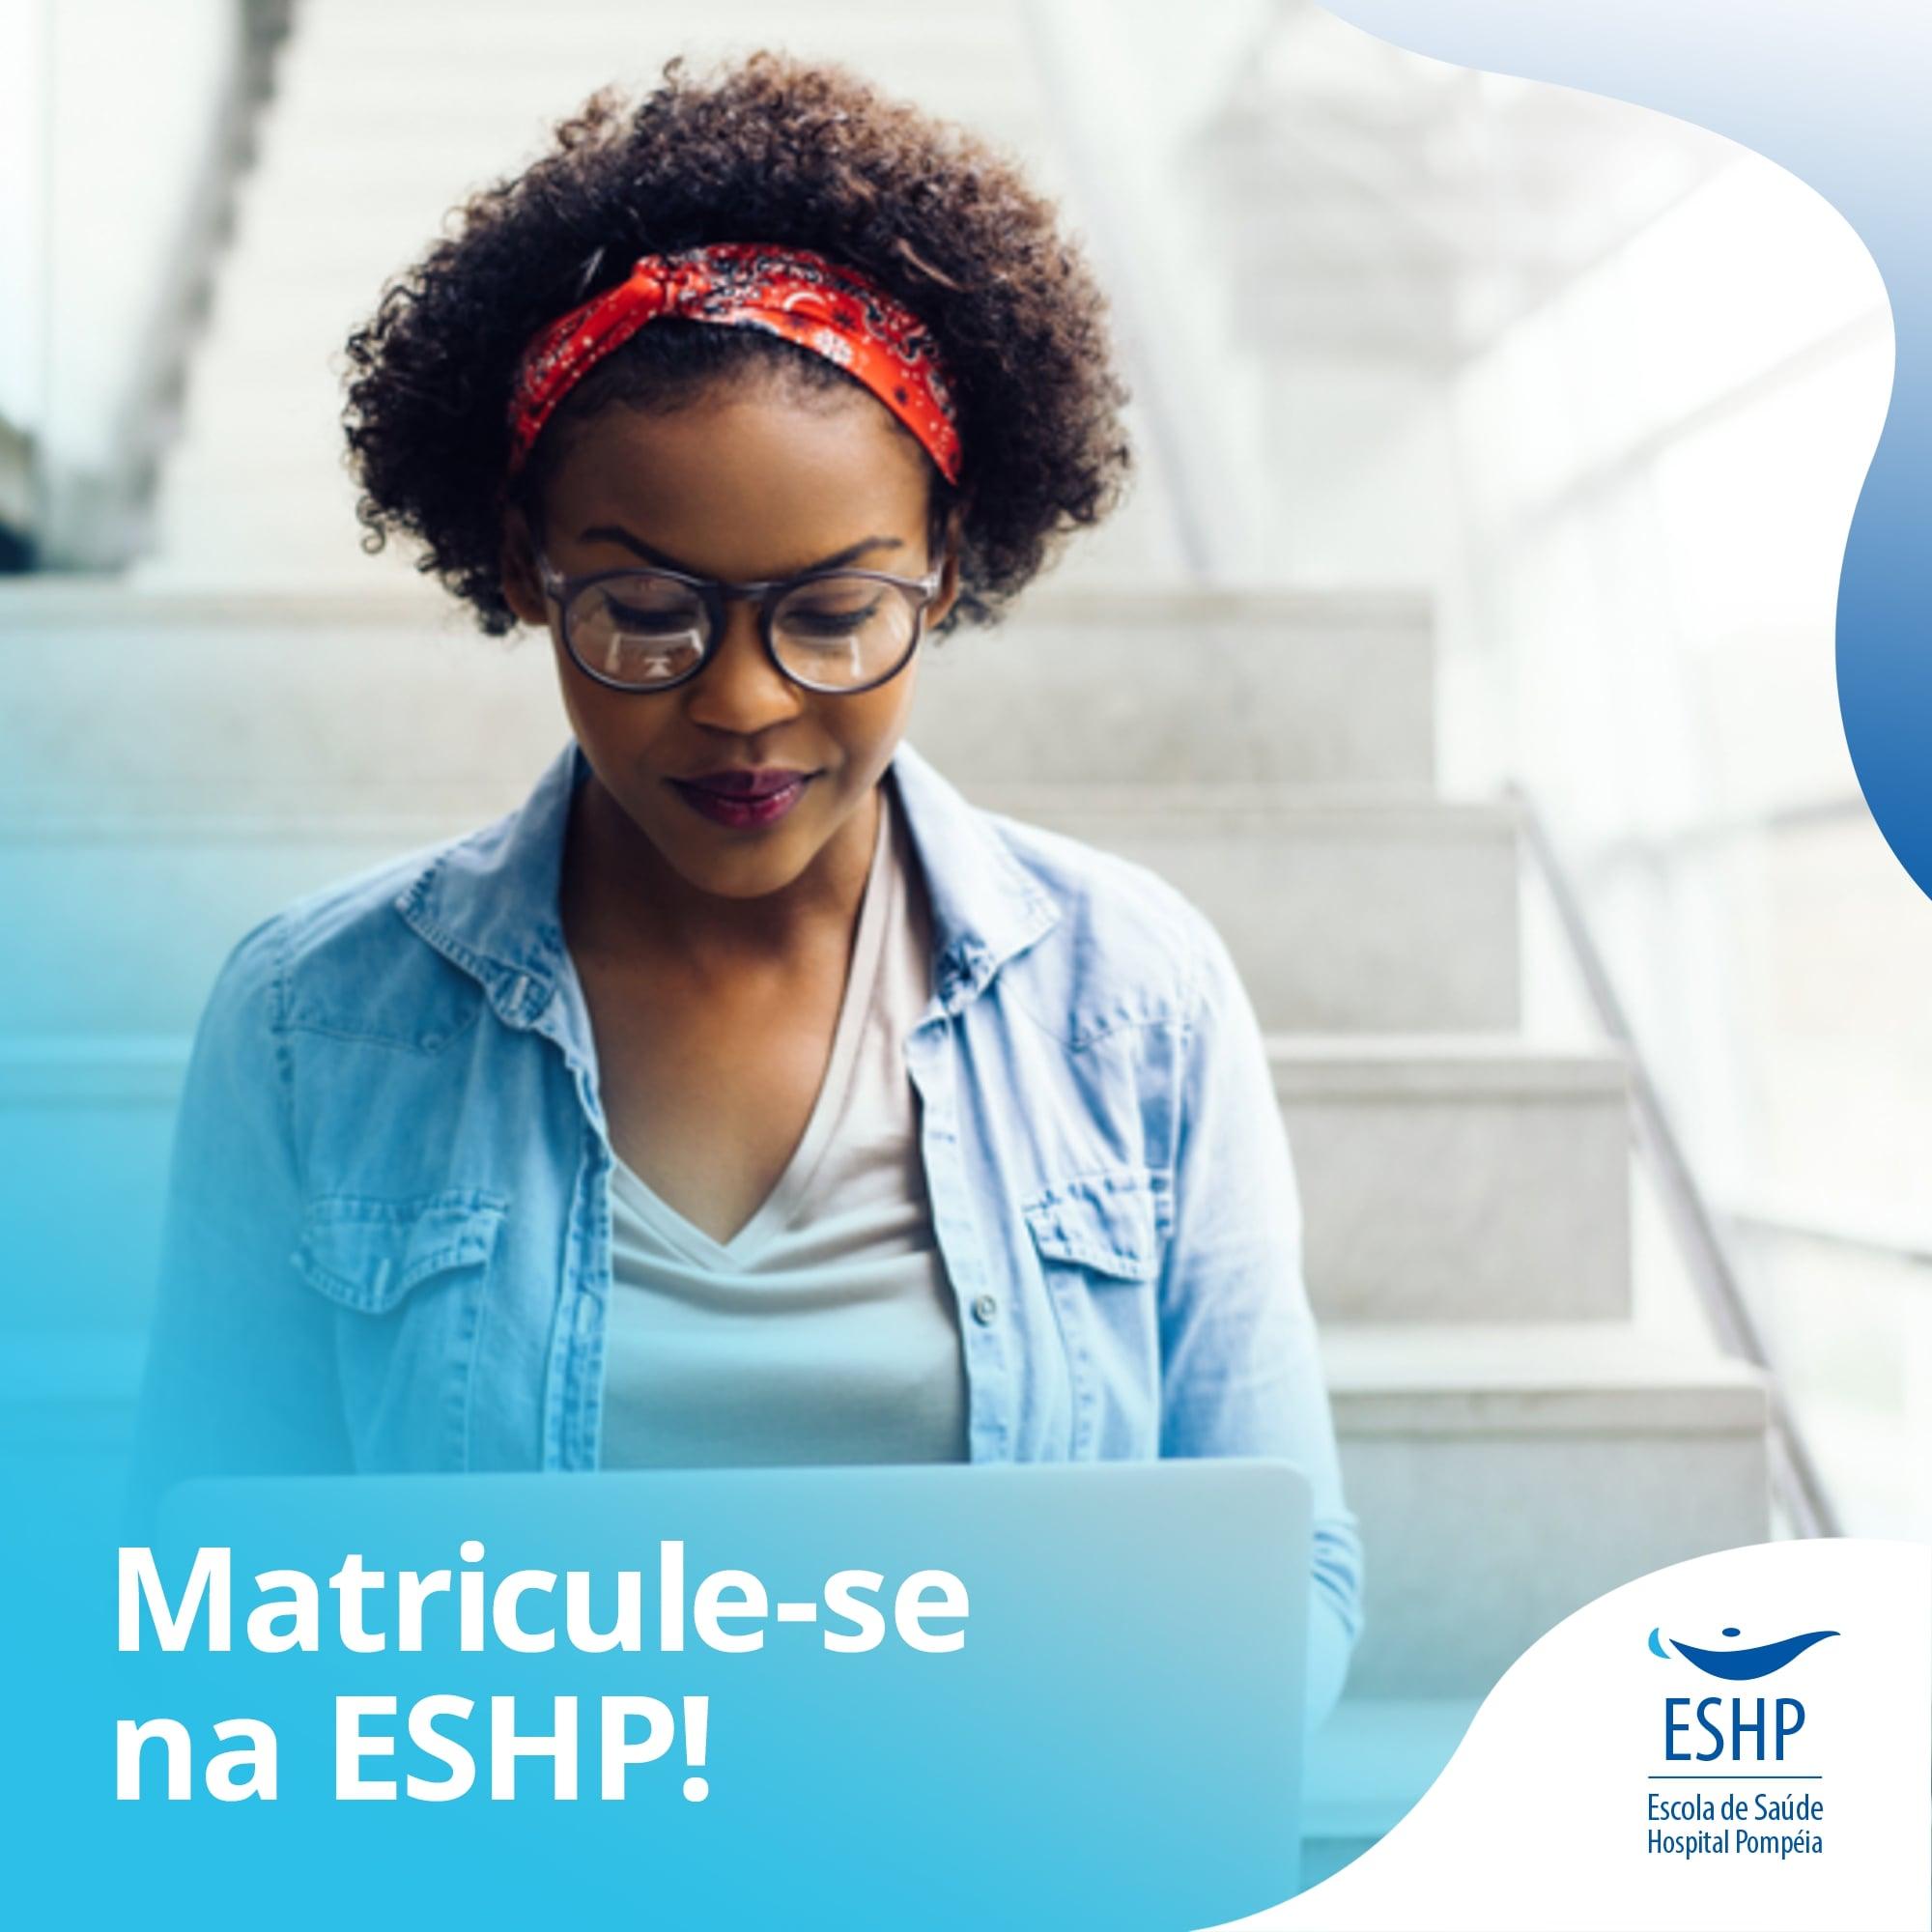 Matricule-se na ESHP!